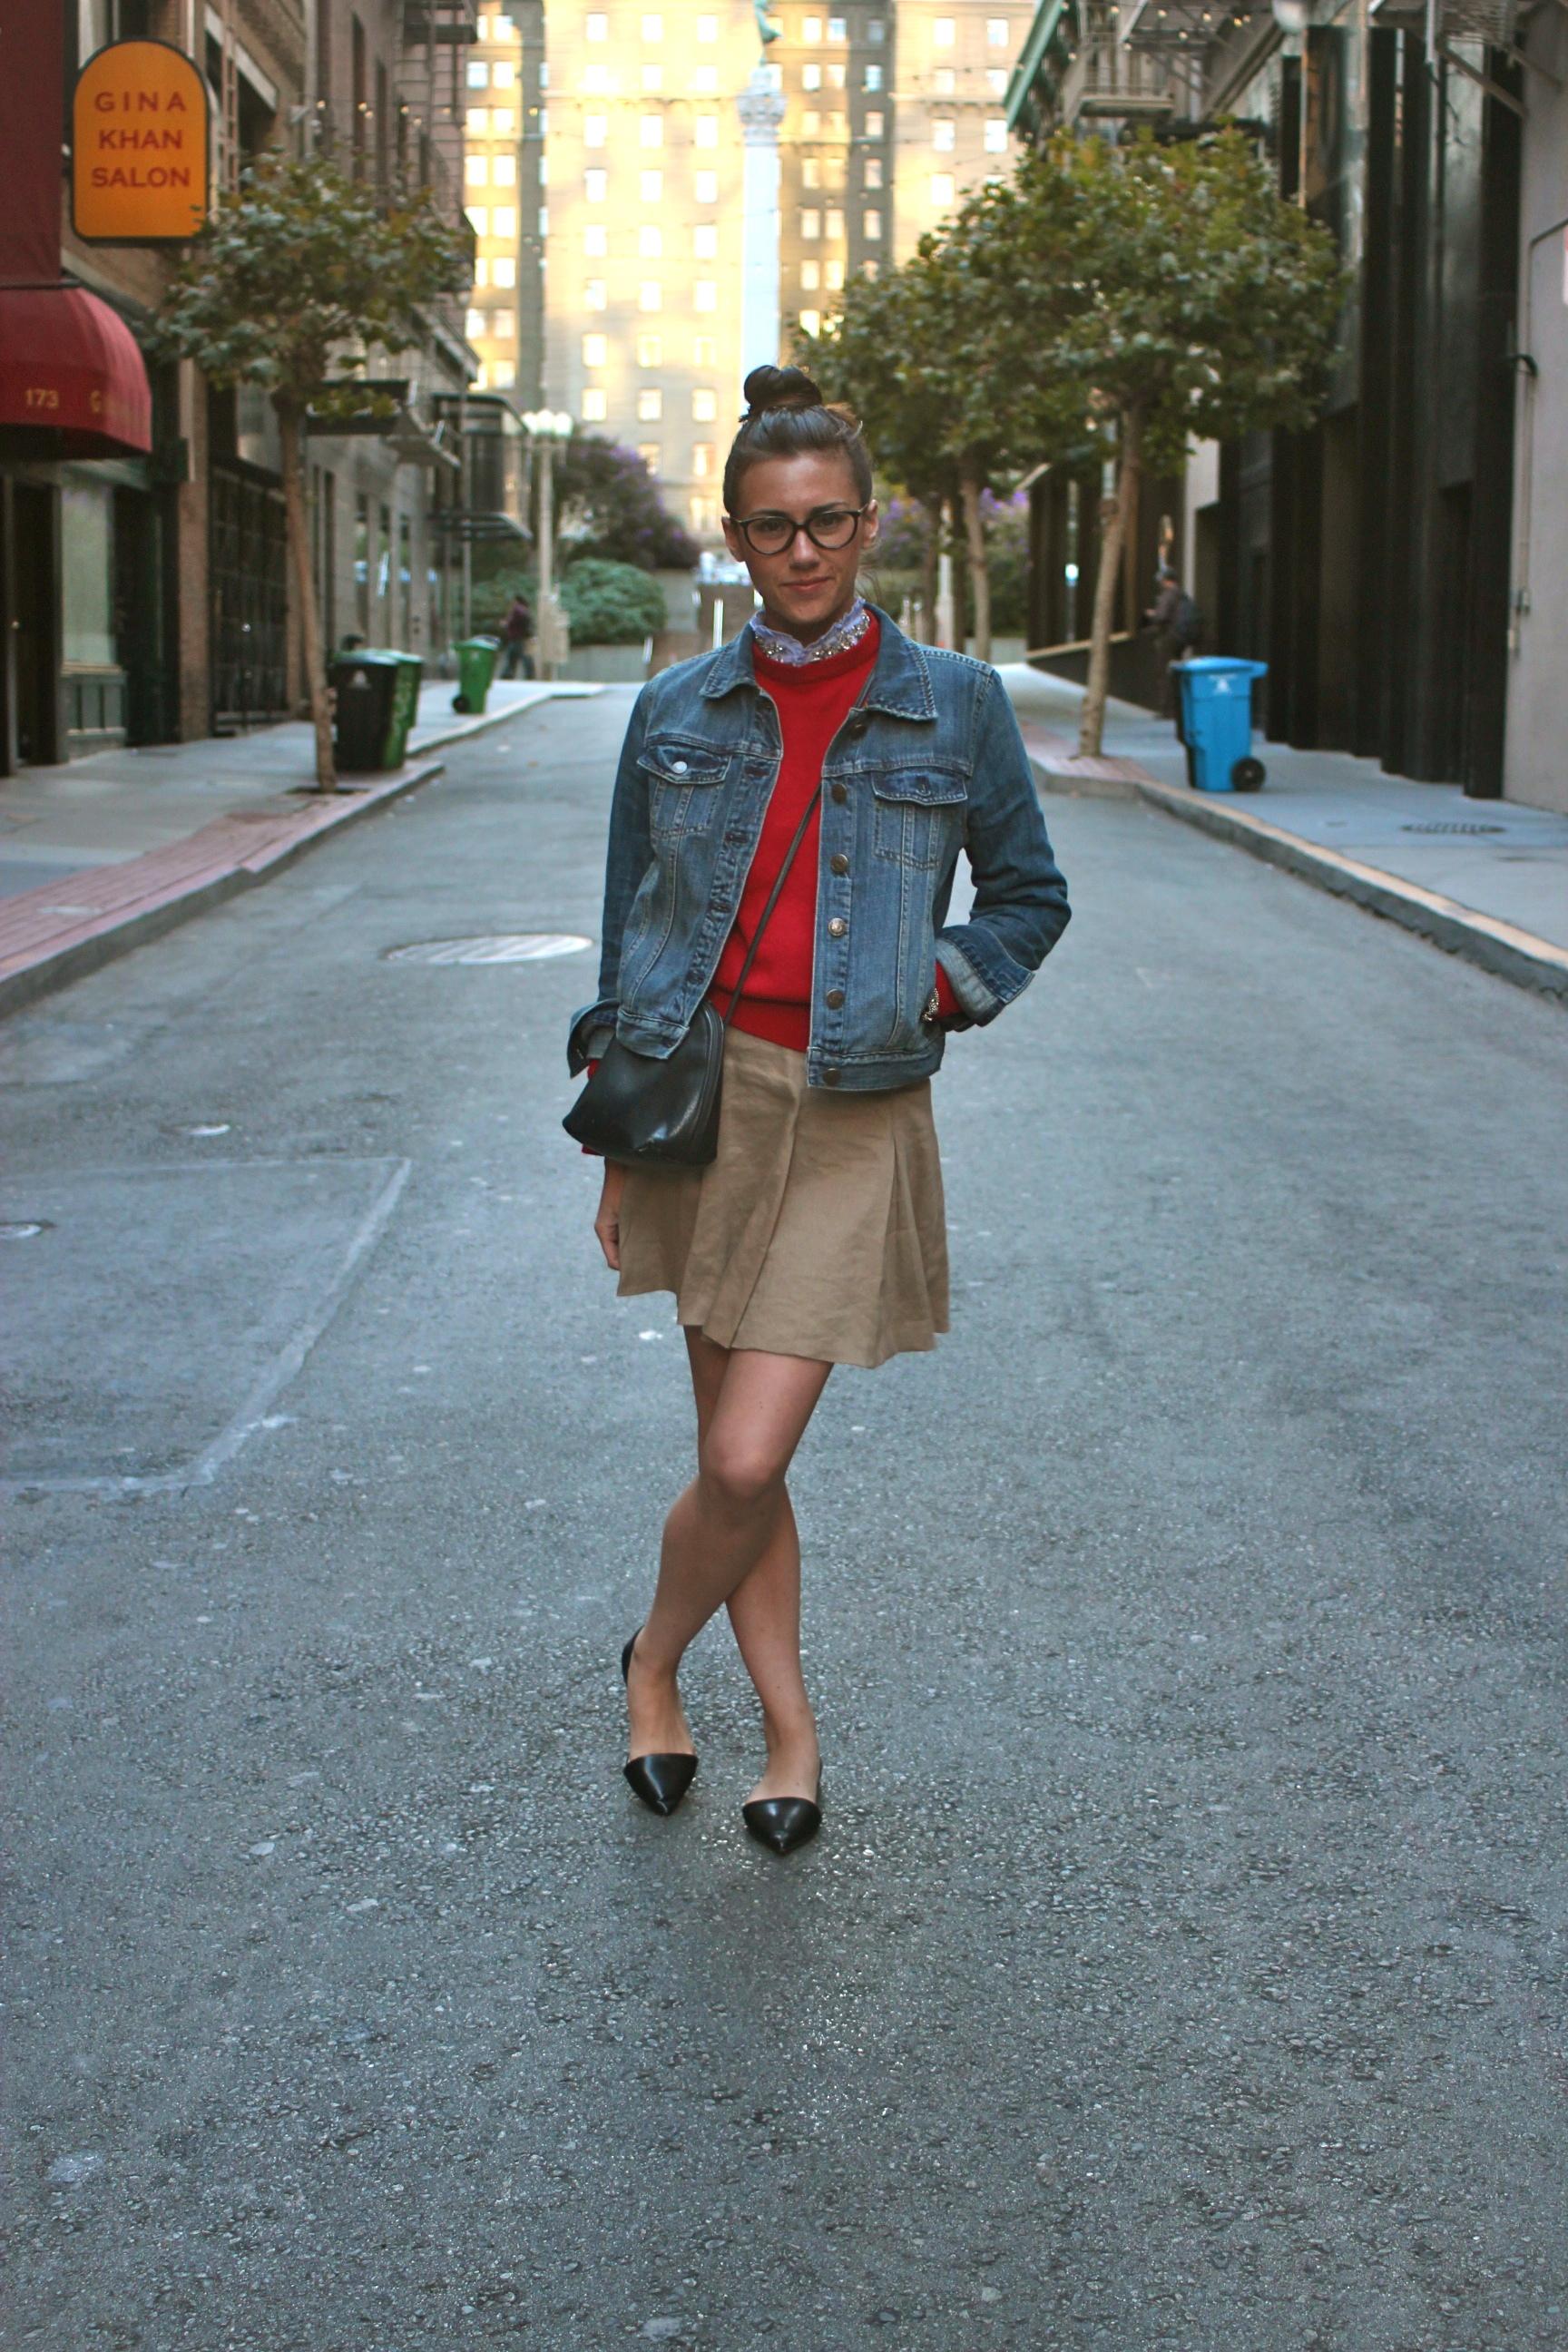 Denim Jacket: J.Crew; Wool Sweater: Vintage; Blouse: J.Crew; Skirt: Alice + Olivia; Flats: Zara; Purse: Vintage, circa 1980 ; Bracelet: Liquid Metal Jewelry